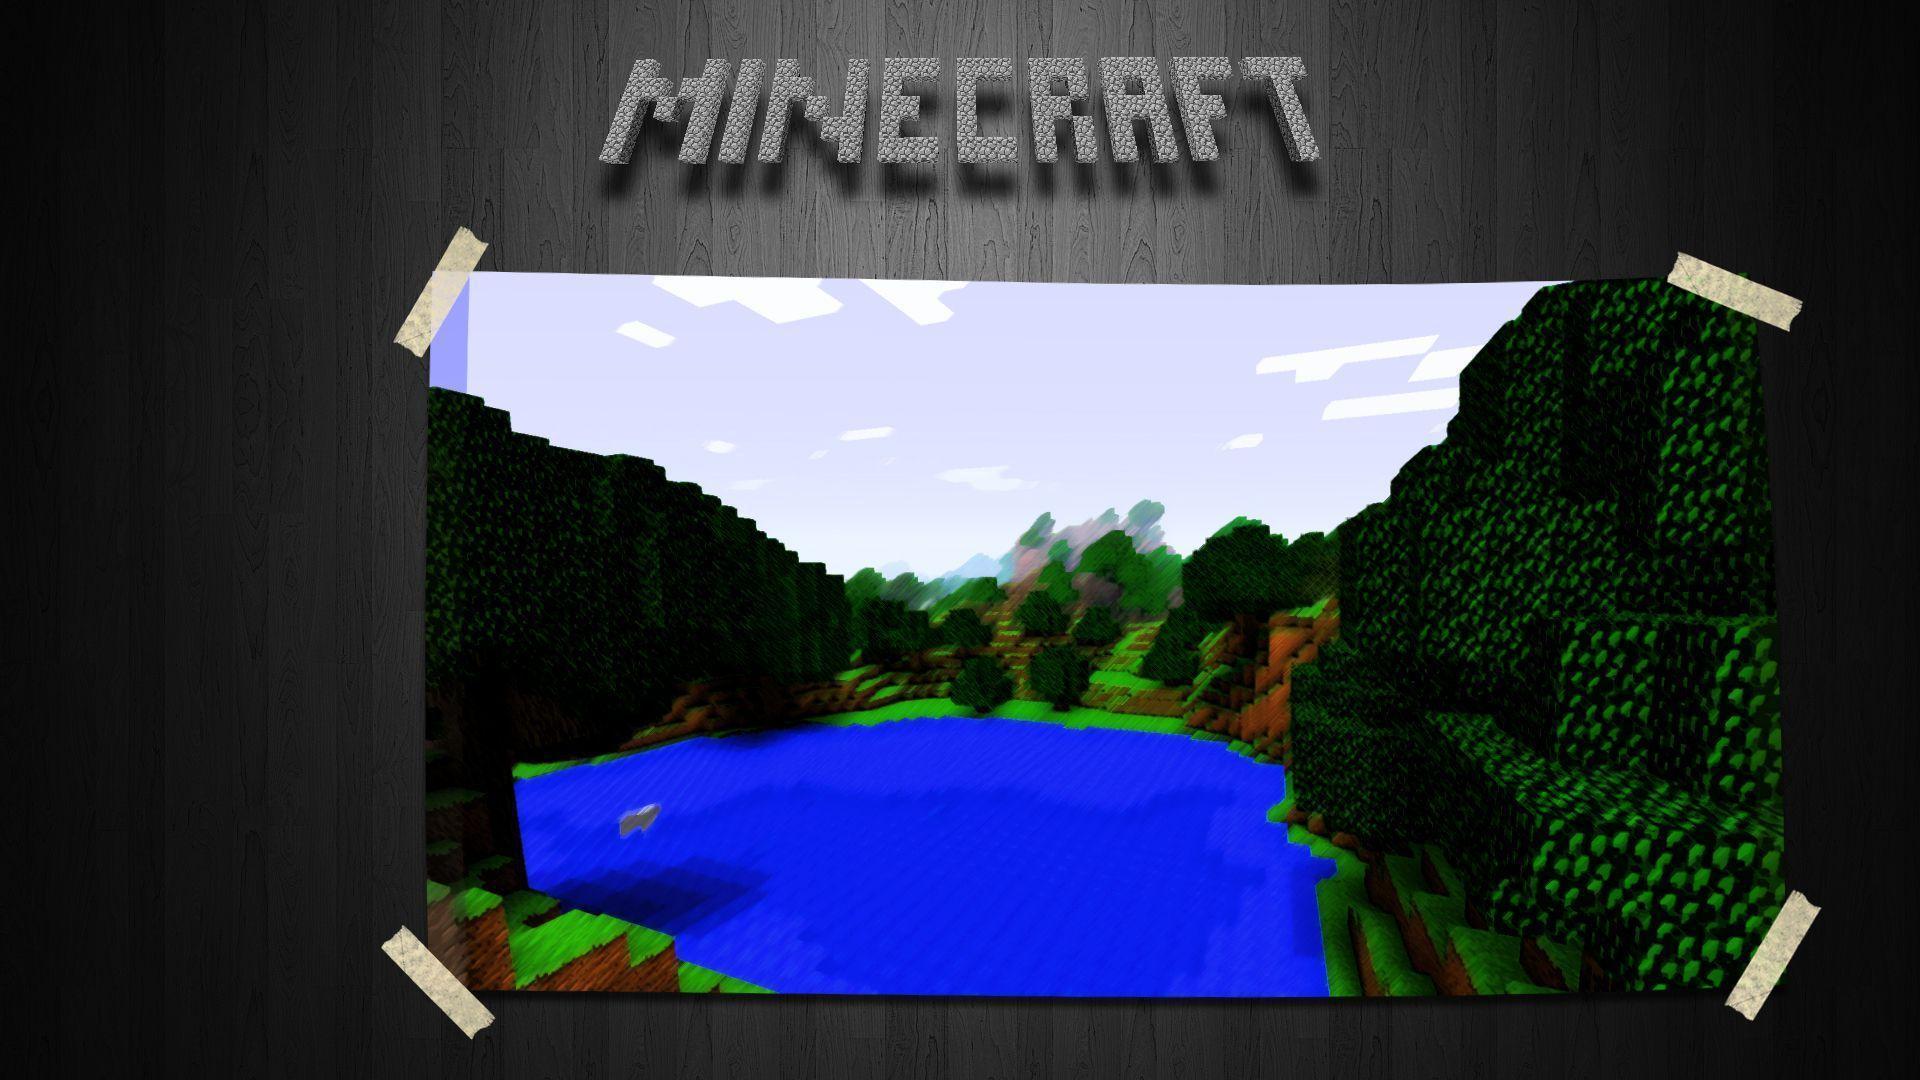 minecraft island wallpaper 1080p - photo #21